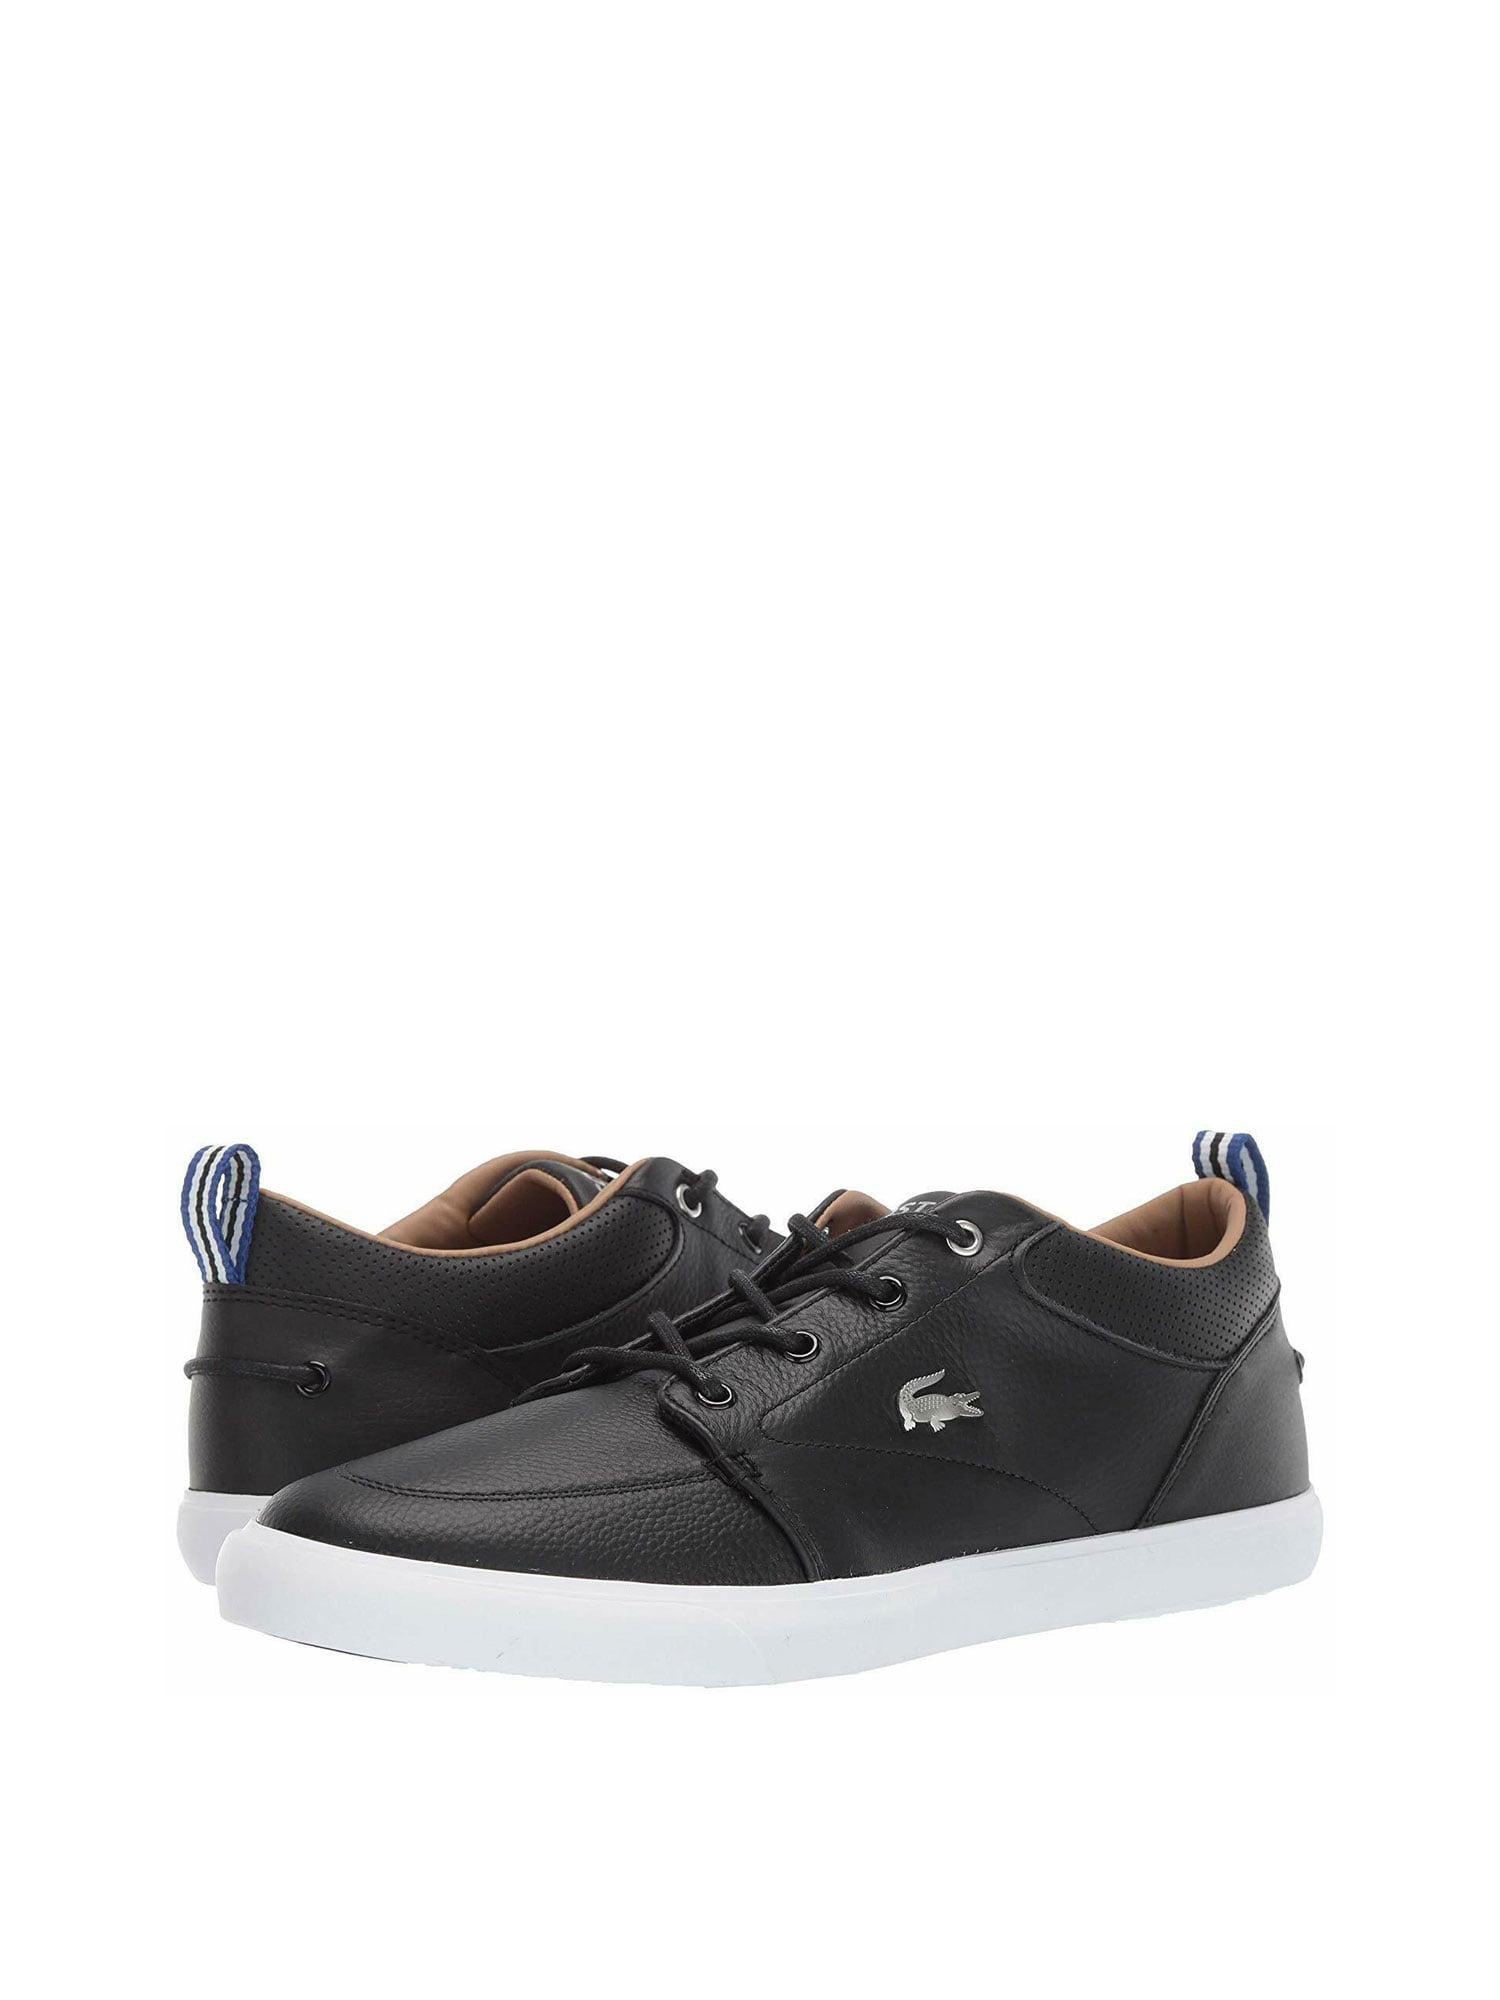 Men/'s Shoes Lacoste BAYLISS 119 1 U Fashion Sneakers 37CMA007321G WHITE